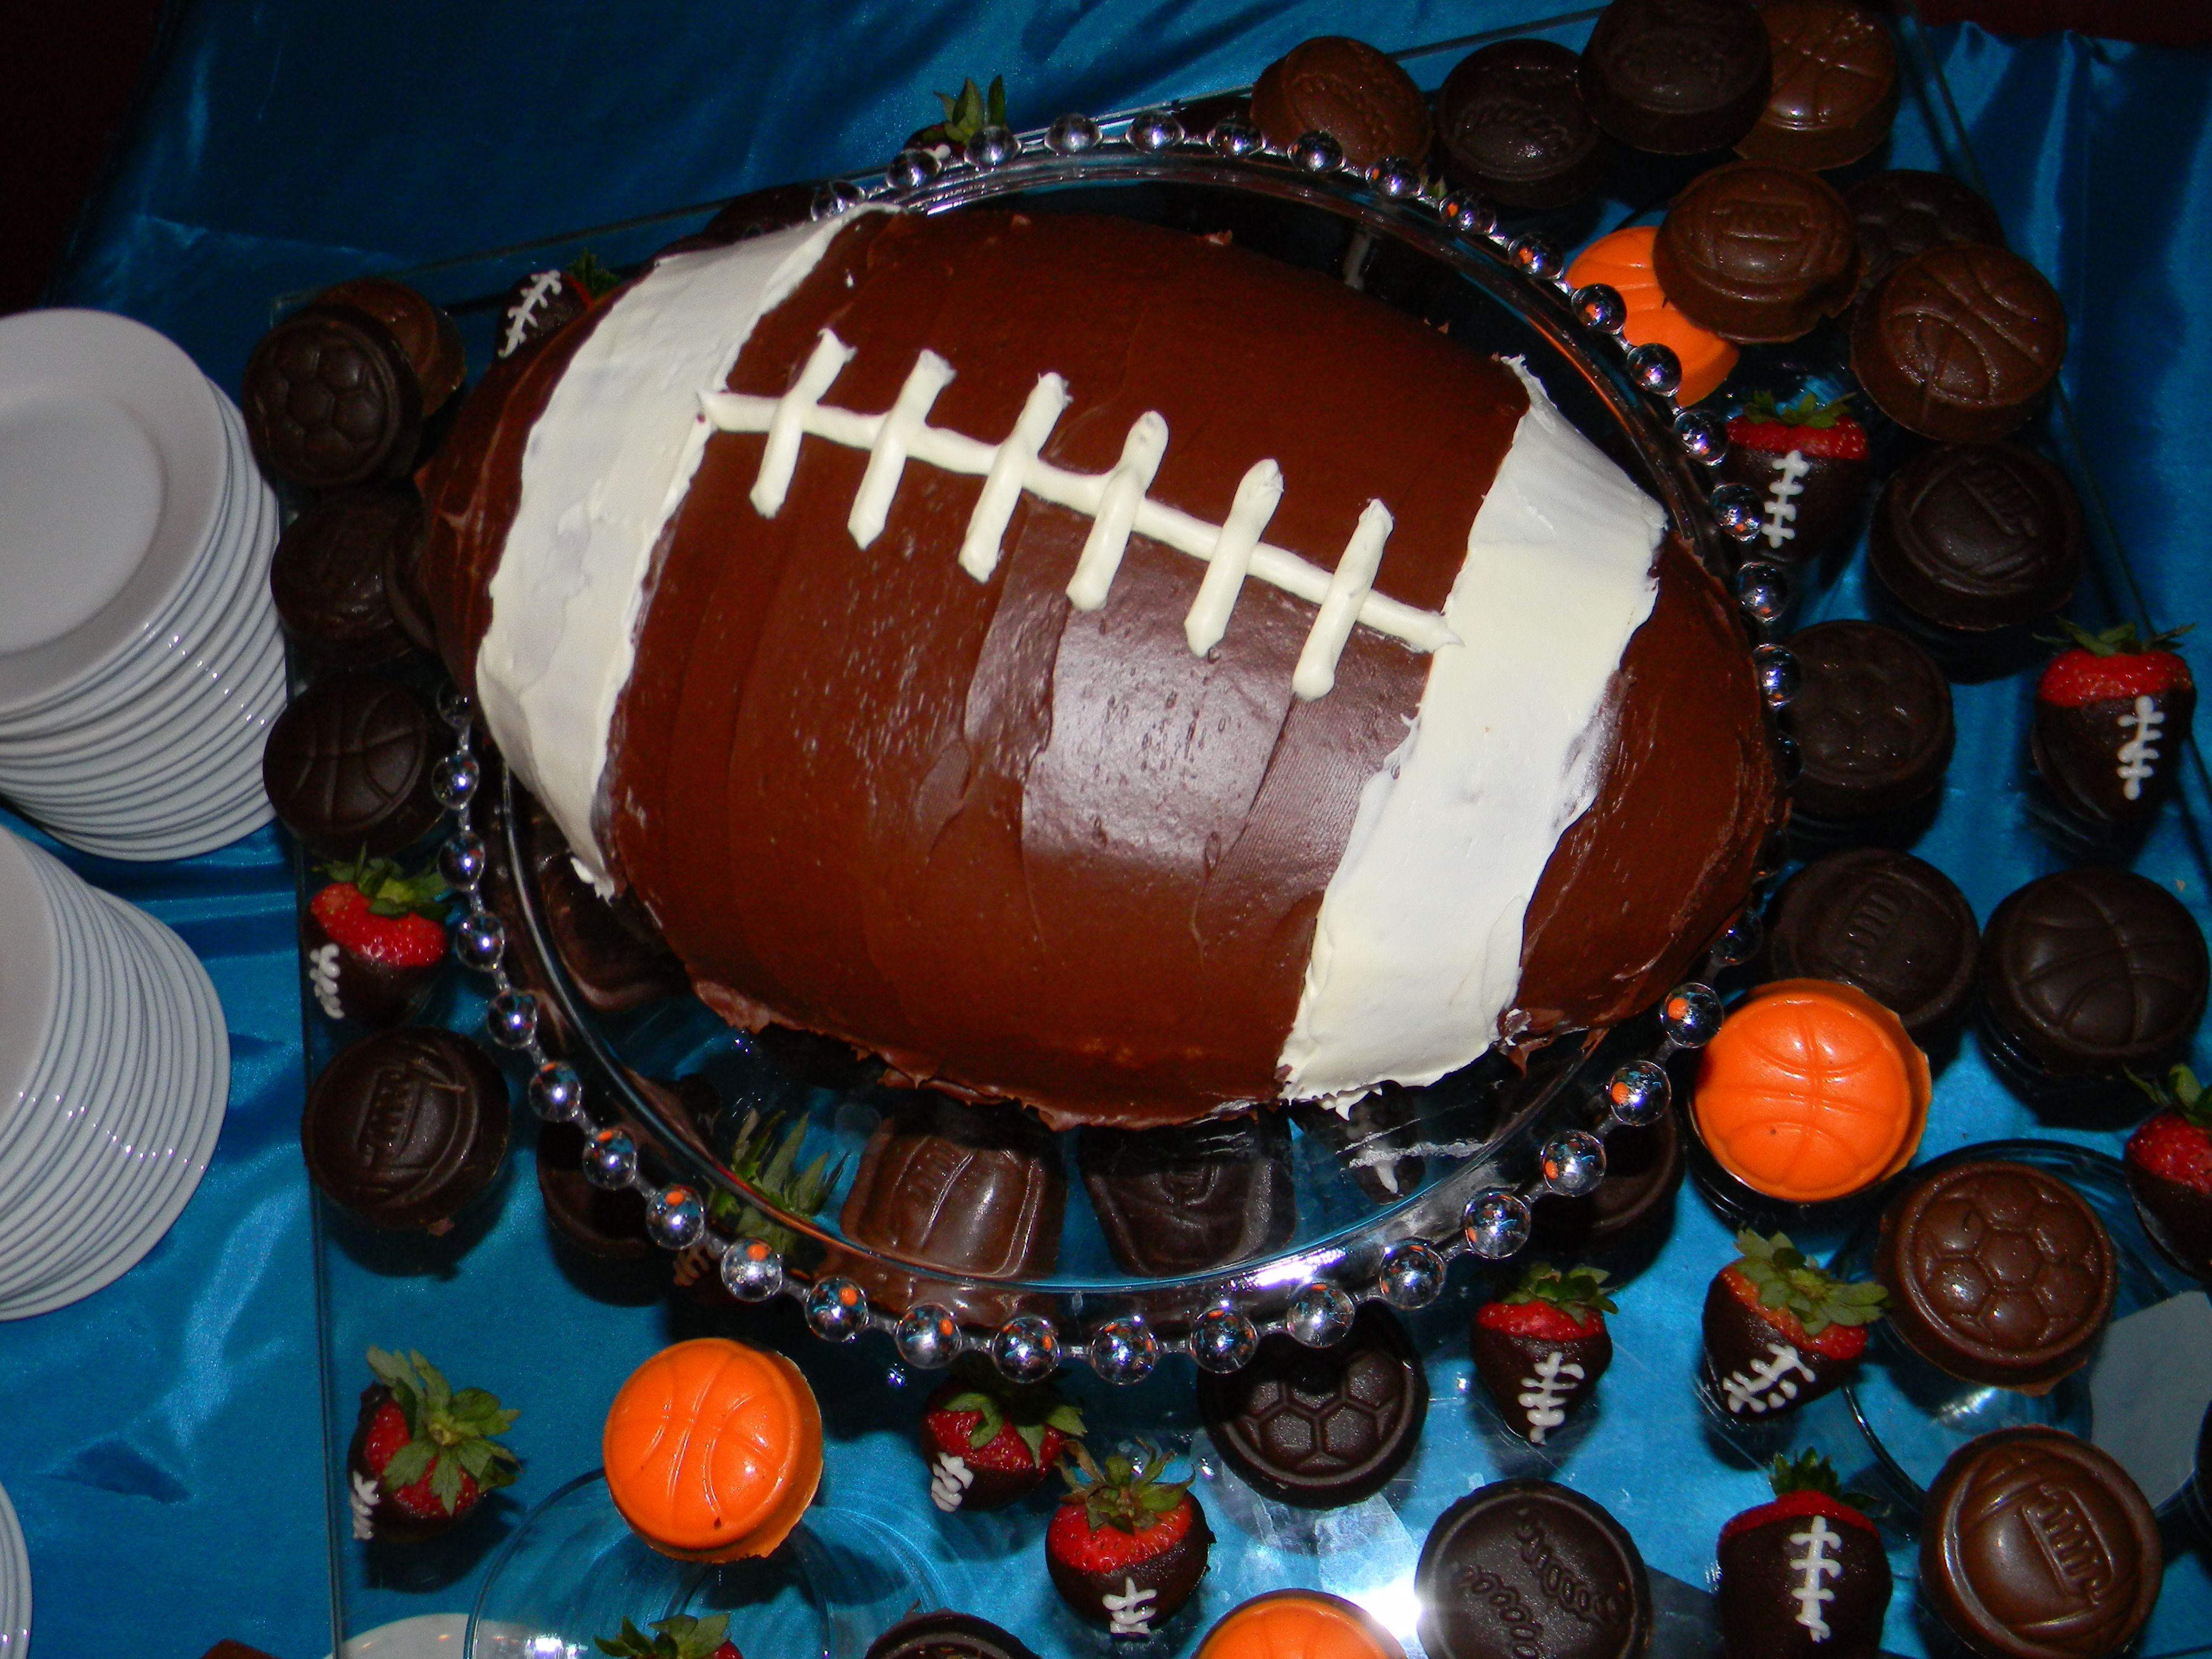 Sports themed desserts